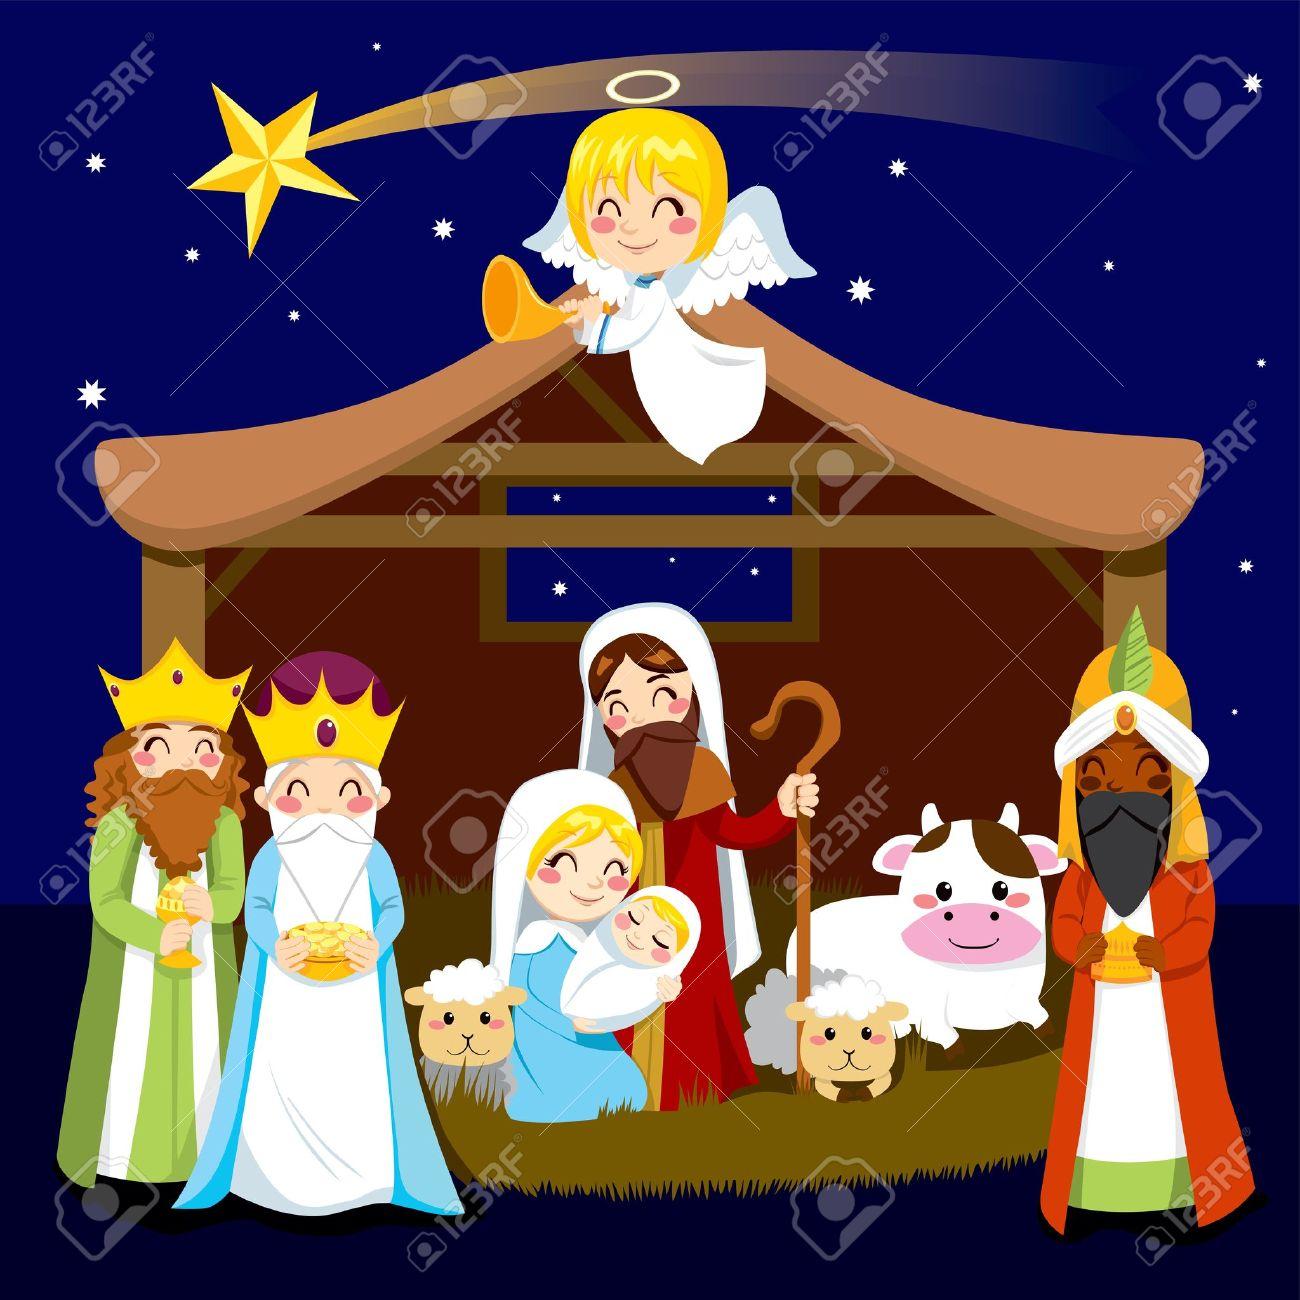 8,325 Christmas Nativity Cliparts, Stock Vector And Royalty Free.